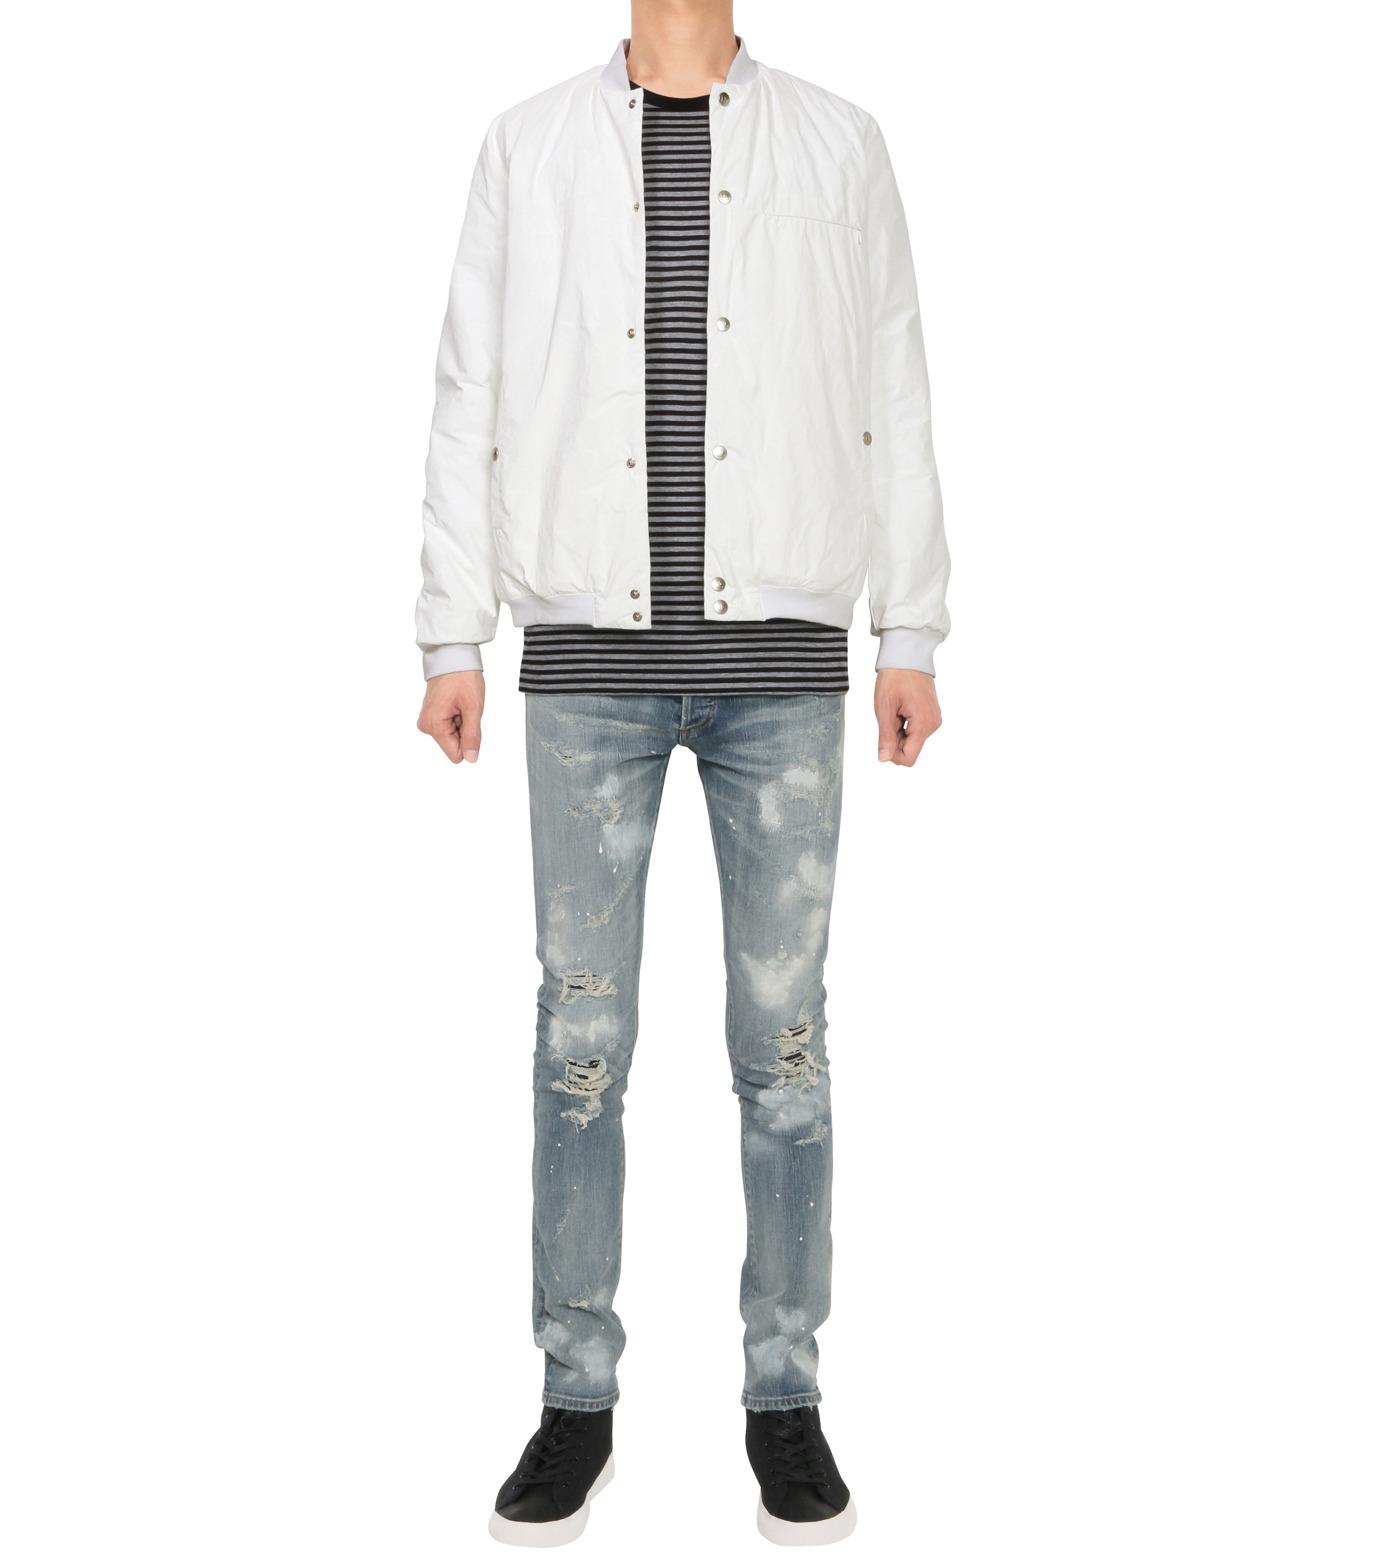 HL HEDDIE LOVU(エイチエル・エディールーヴ)のPAPER RIB COLLAR JACKET-WHITE(ジャケット/jacket)-18A94004-4 拡大詳細画像3